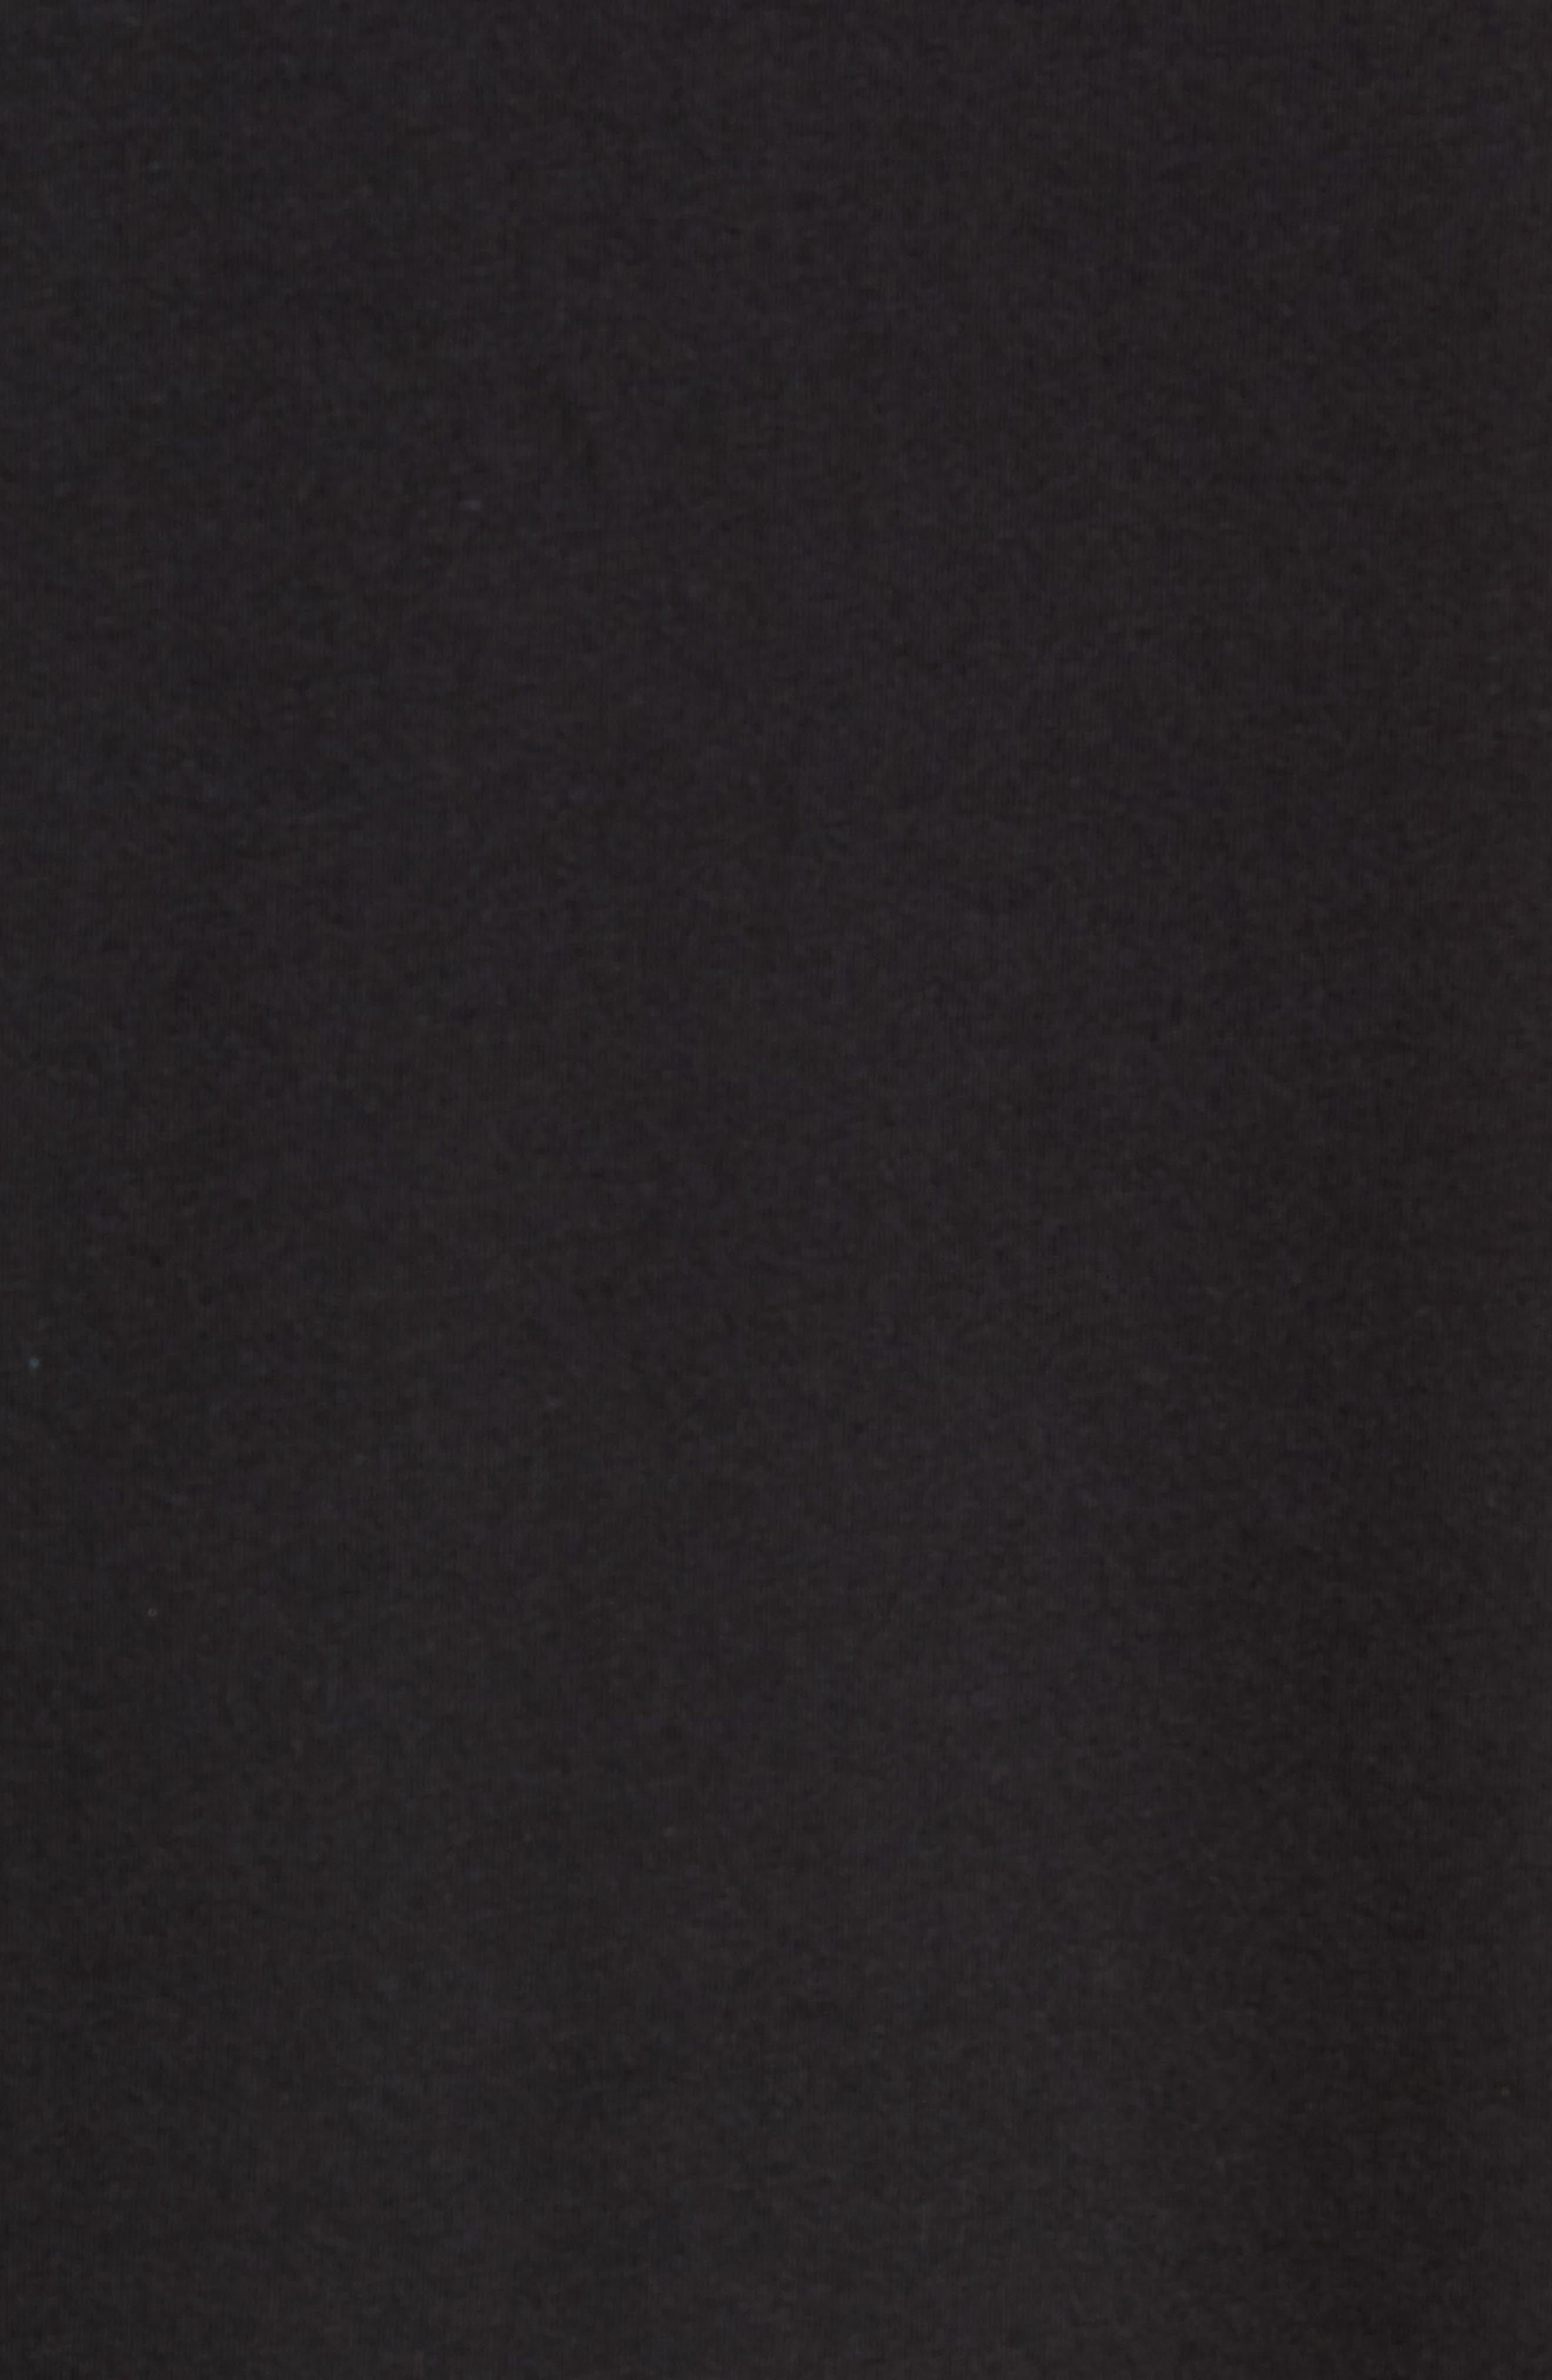 ALO, Triumph Tank, Alternate thumbnail 5, color, SOLID BLACK TRIBLEND